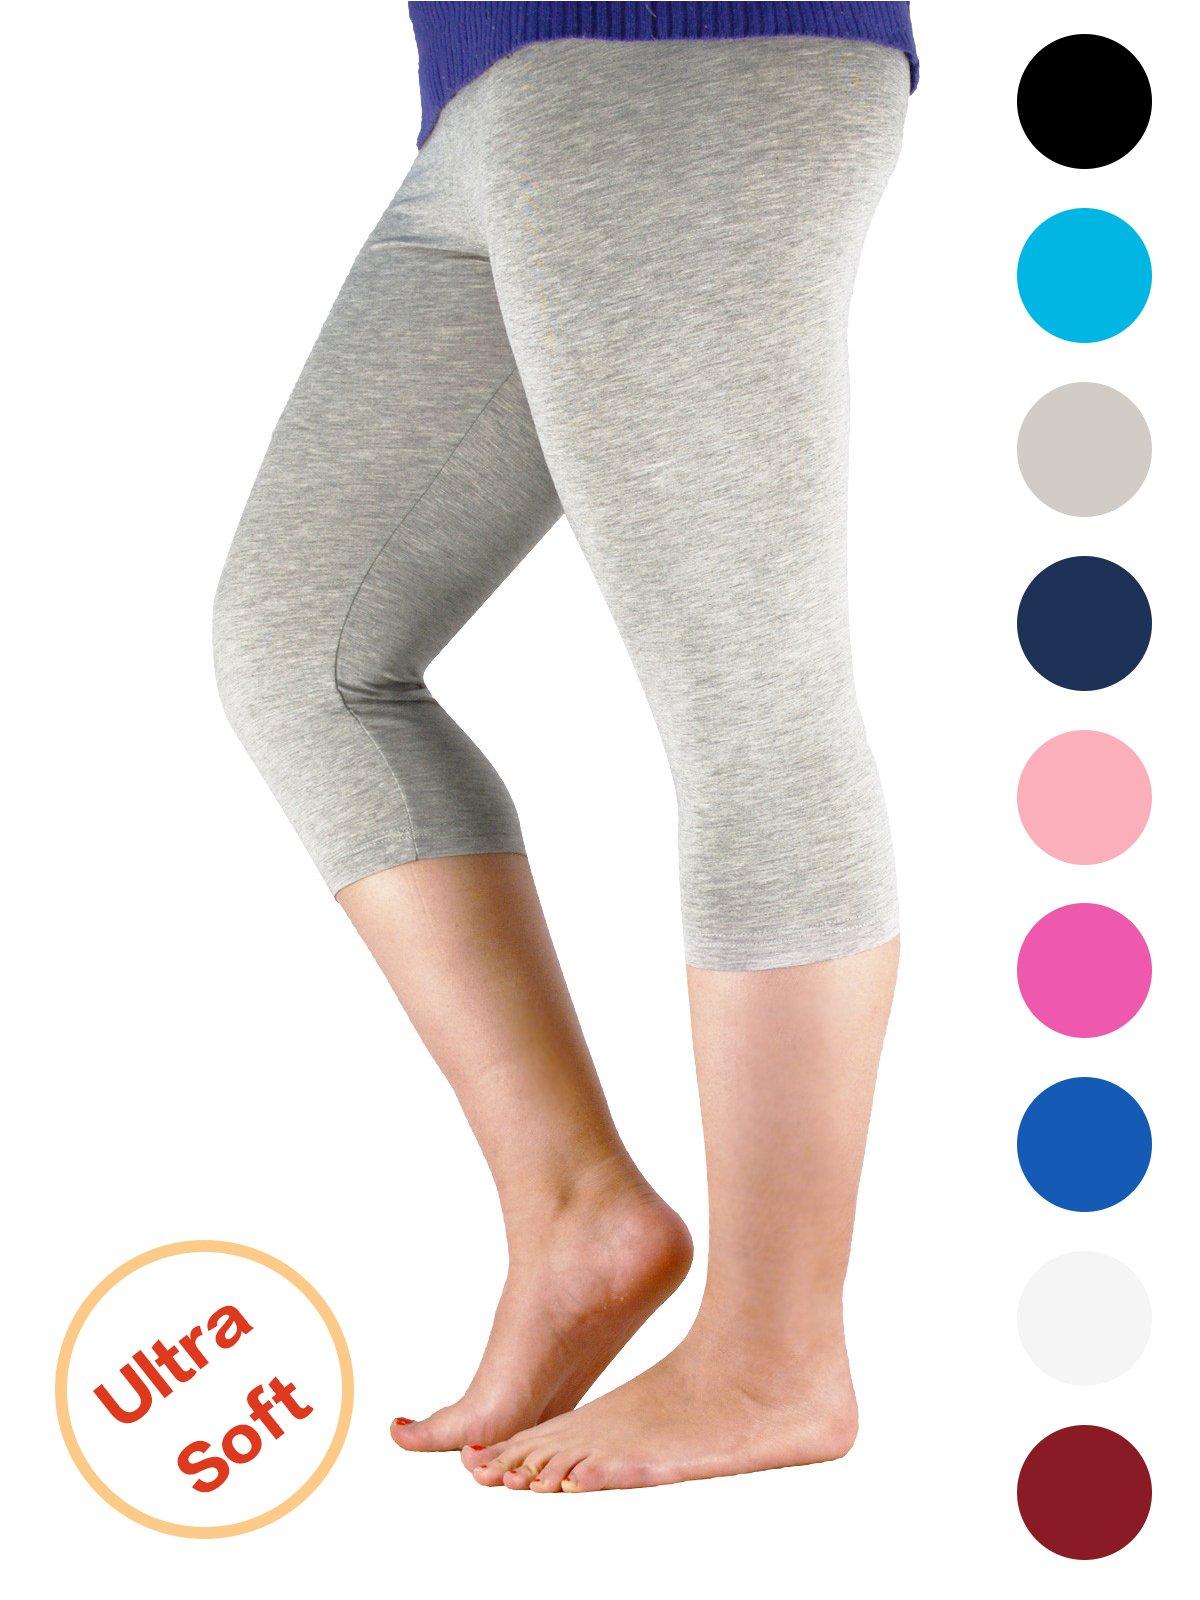 Premium Soft Light Comfy Fit Bamboo Capri Pants Under Dress Leggings for Women Regular and Plus Size Grey 4XL (US Size XL)